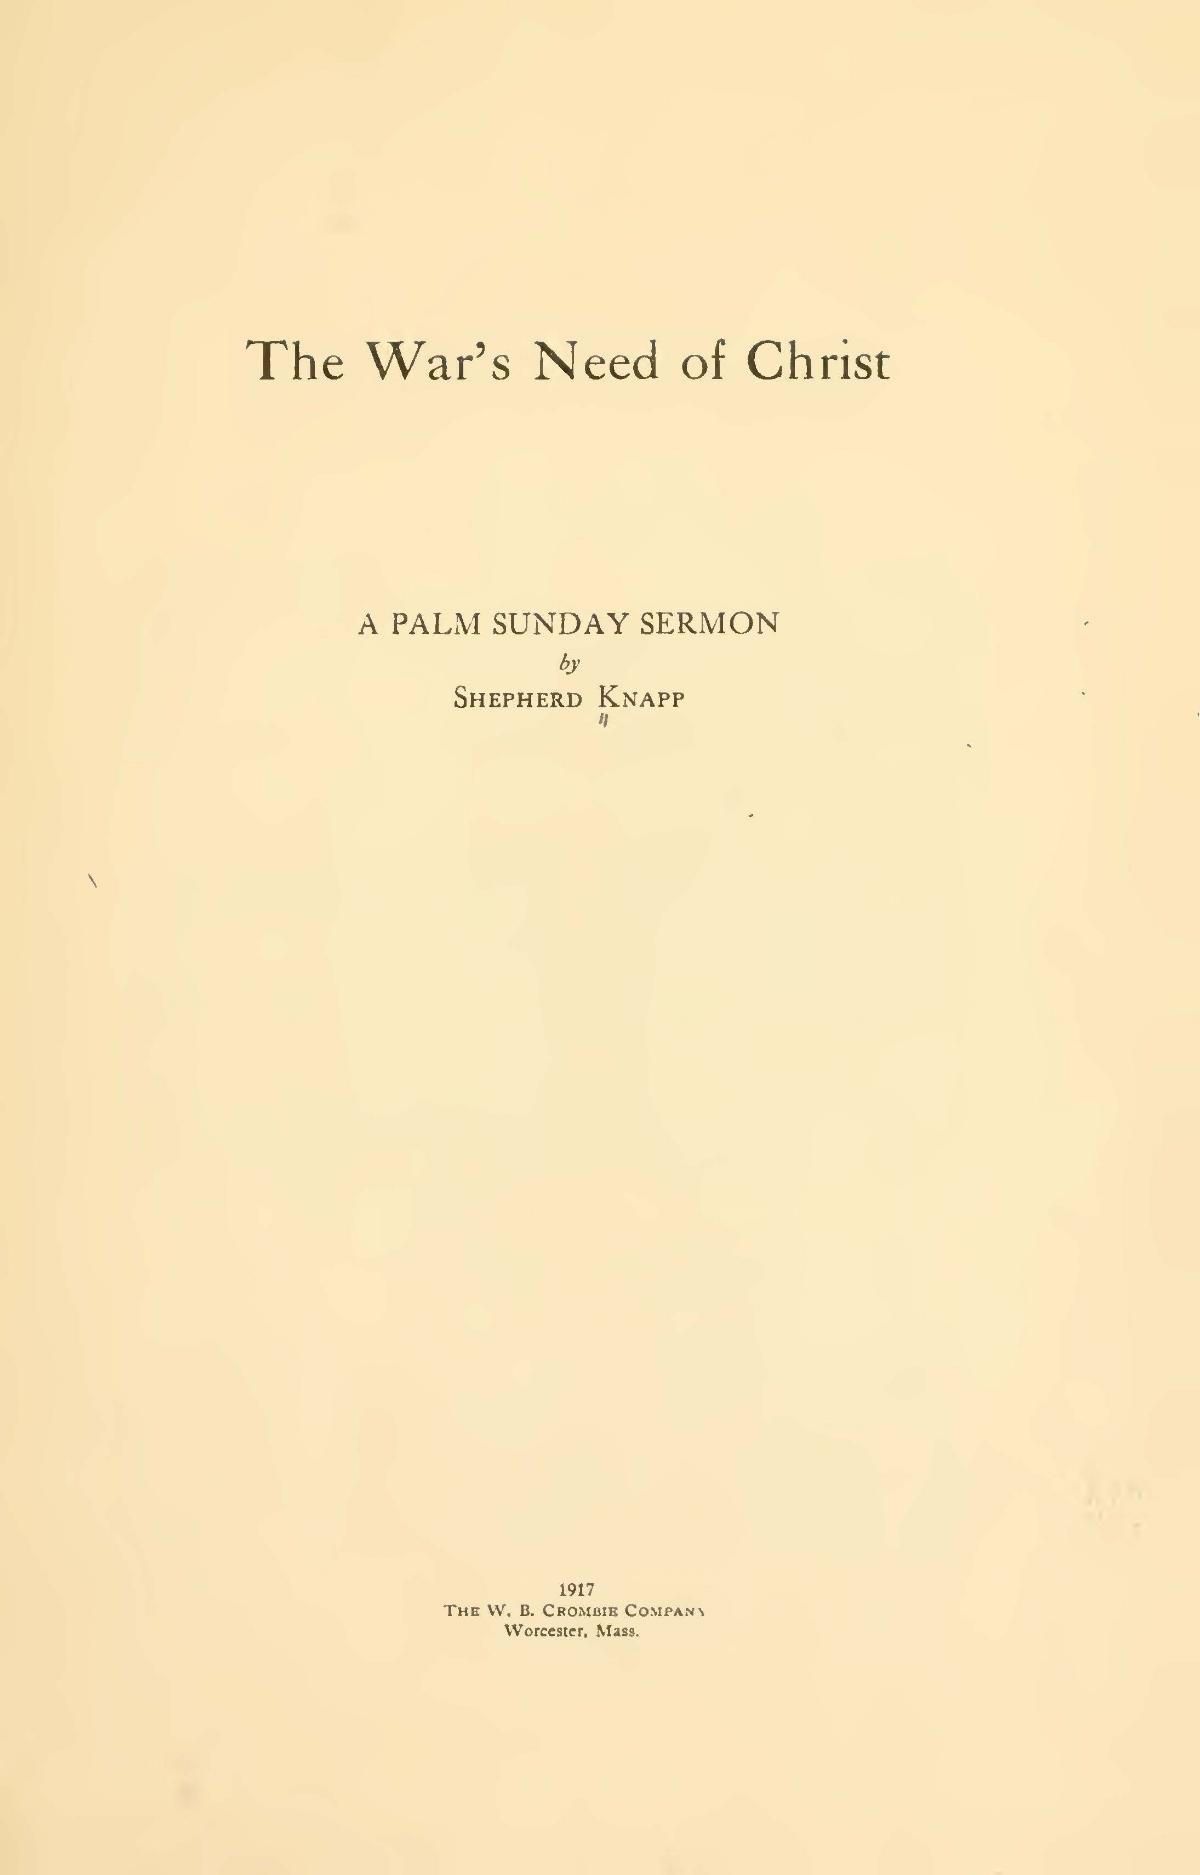 Knapp, Jr., Shepherd, The War's Need of Christ Title Page.jpg